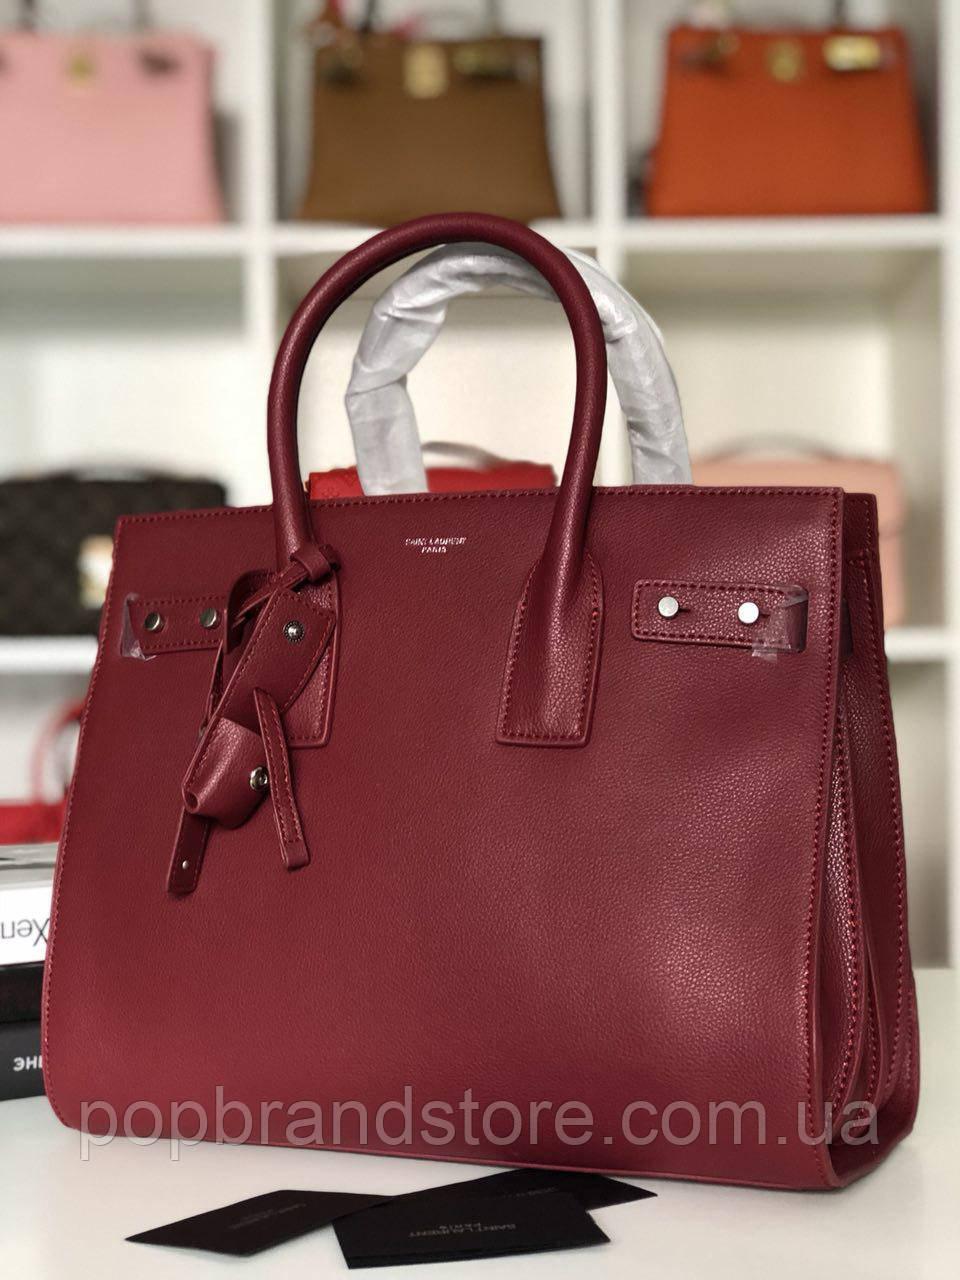 95569c2141d3 Классическая женская сумка SAINT LAURENT Sac de Jour бордо (реплика) - Pop  Brand Store